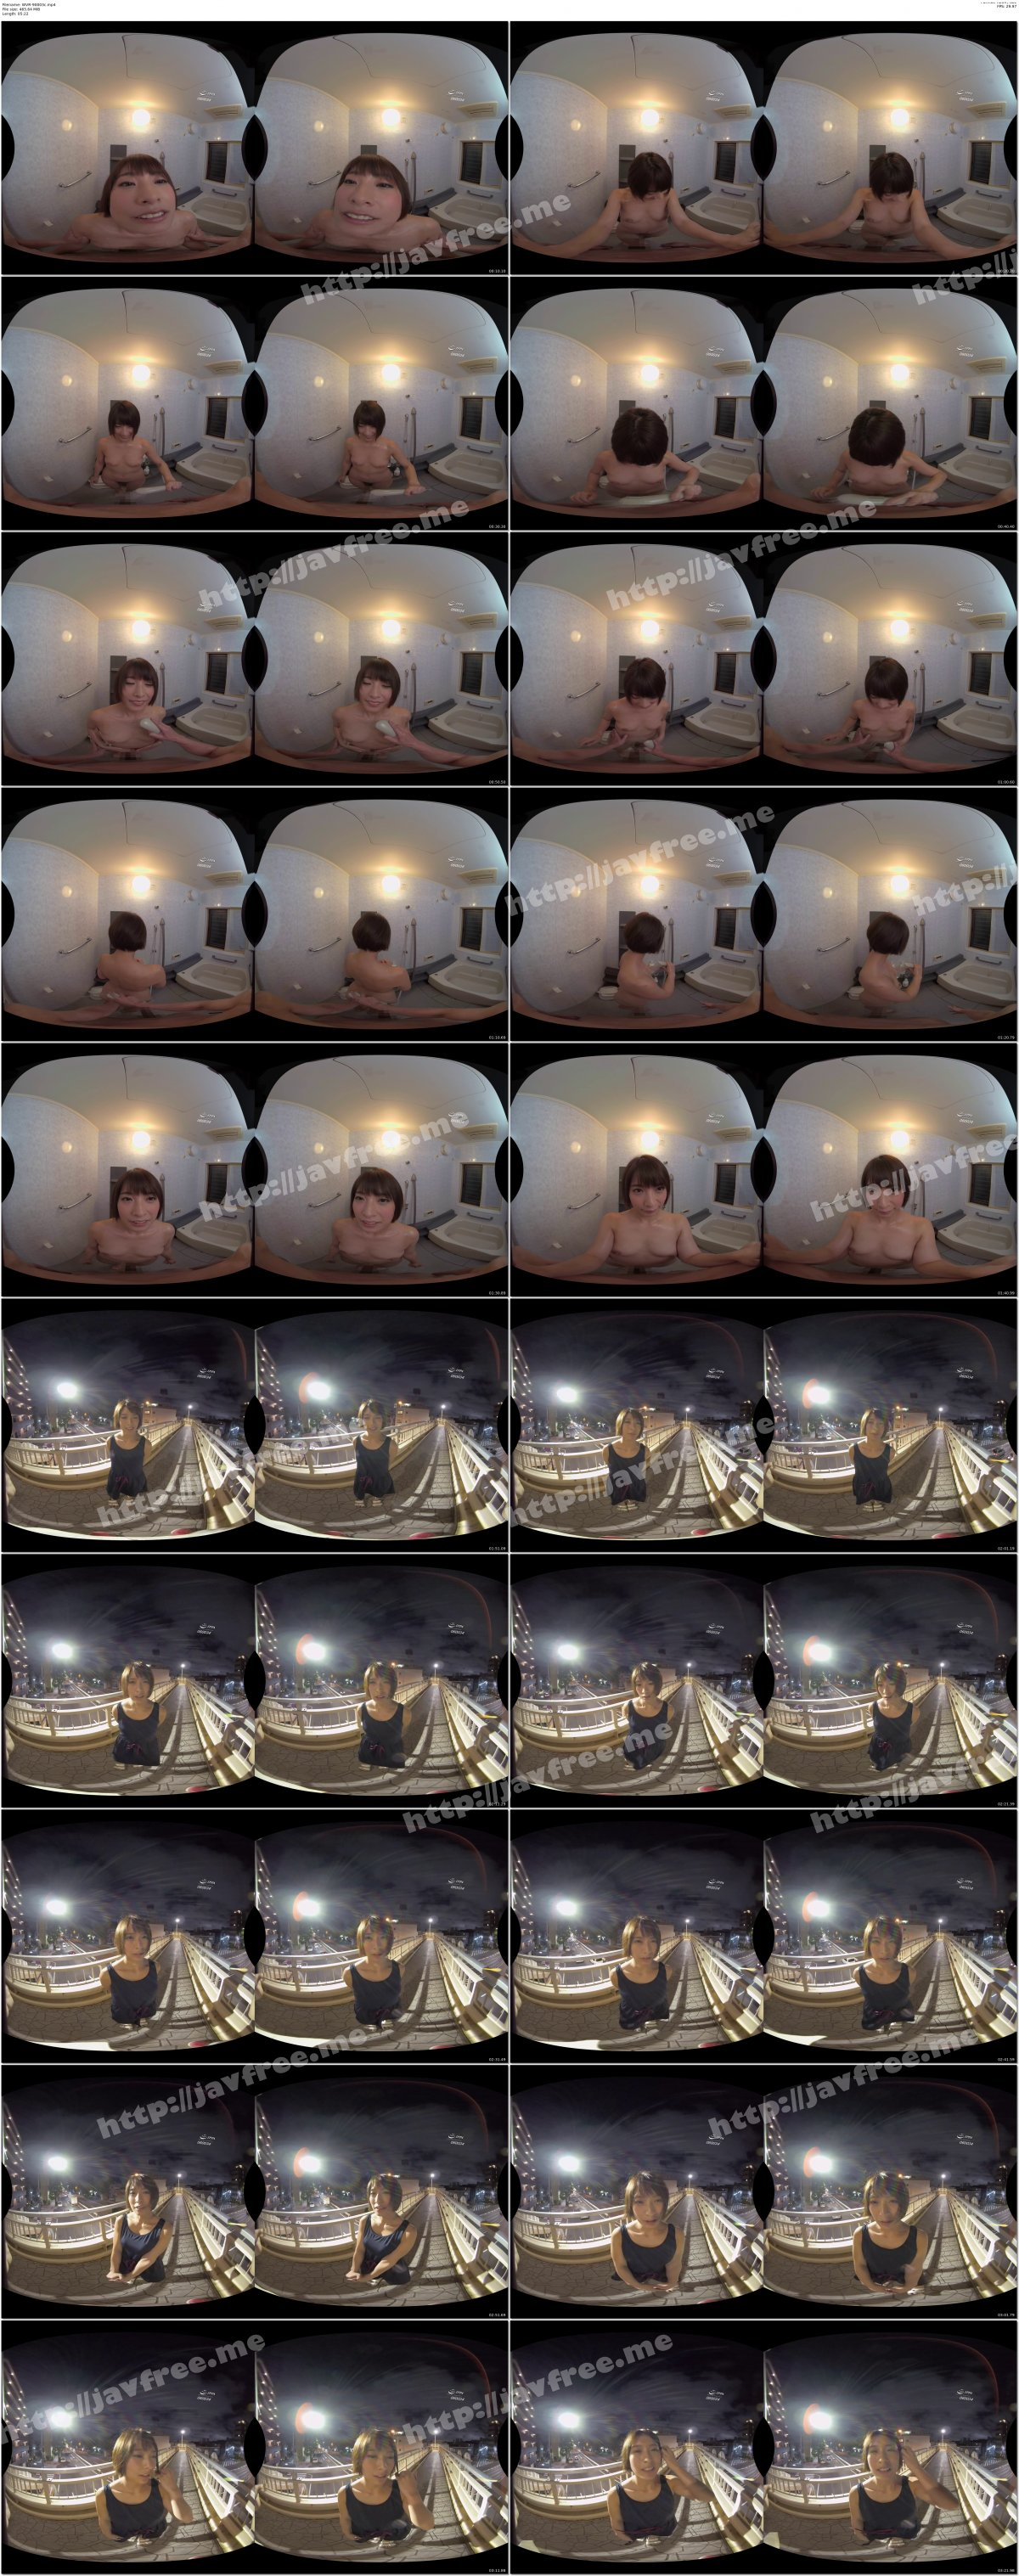 [WVR-90003] 【VR】VR メチャLOVE ドキドキ初デート阿部乃みく 密着大好き!絶対に離さないからね!! - image WVR-90003c on https://javfree.me